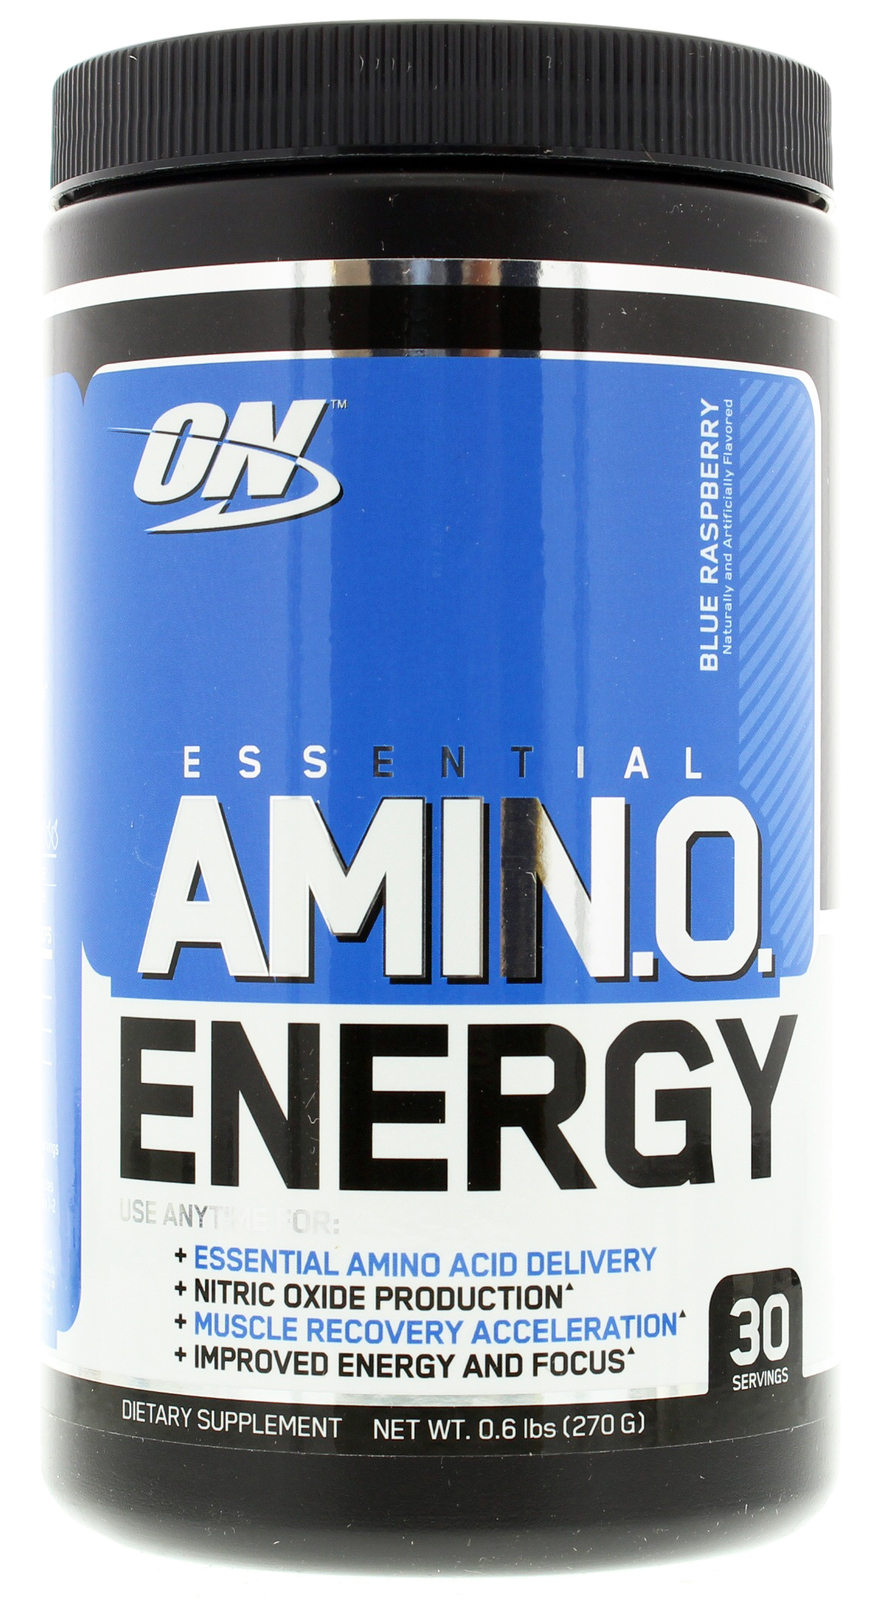 Optimum Nutrition Amino Energy Drink - Blue Raspberry (30 Serves) image